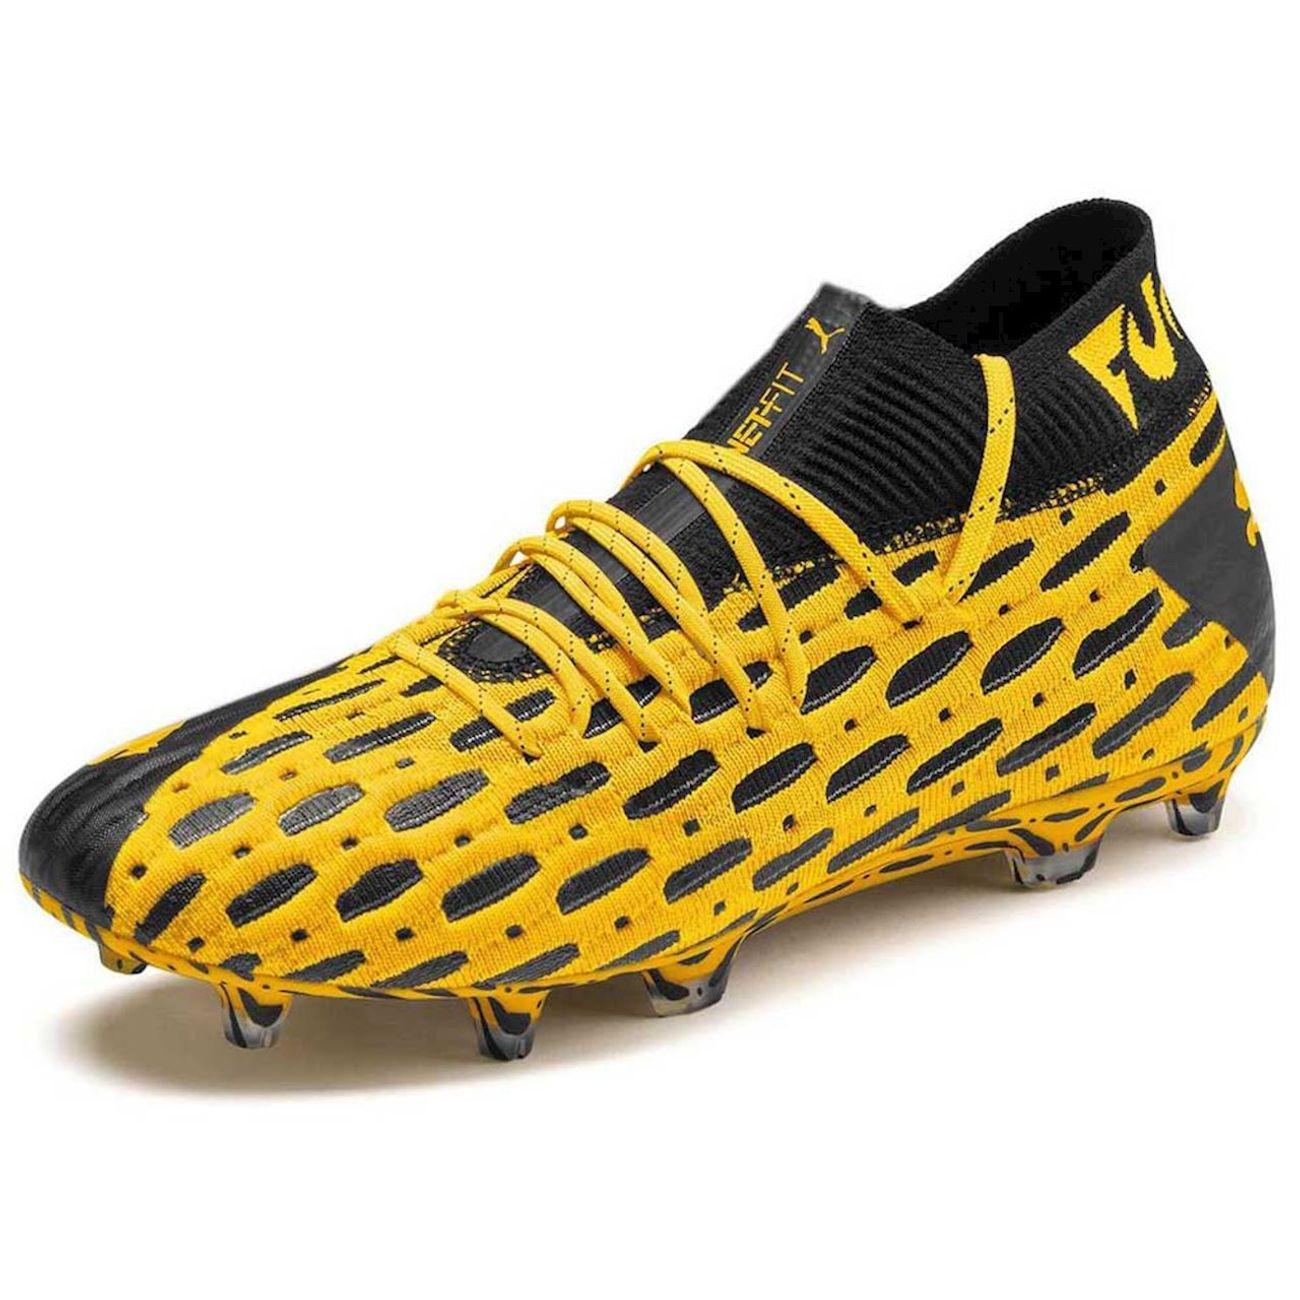 Football homme PUMA Chaussures Puma Future 5.1 Netfit FG/AG